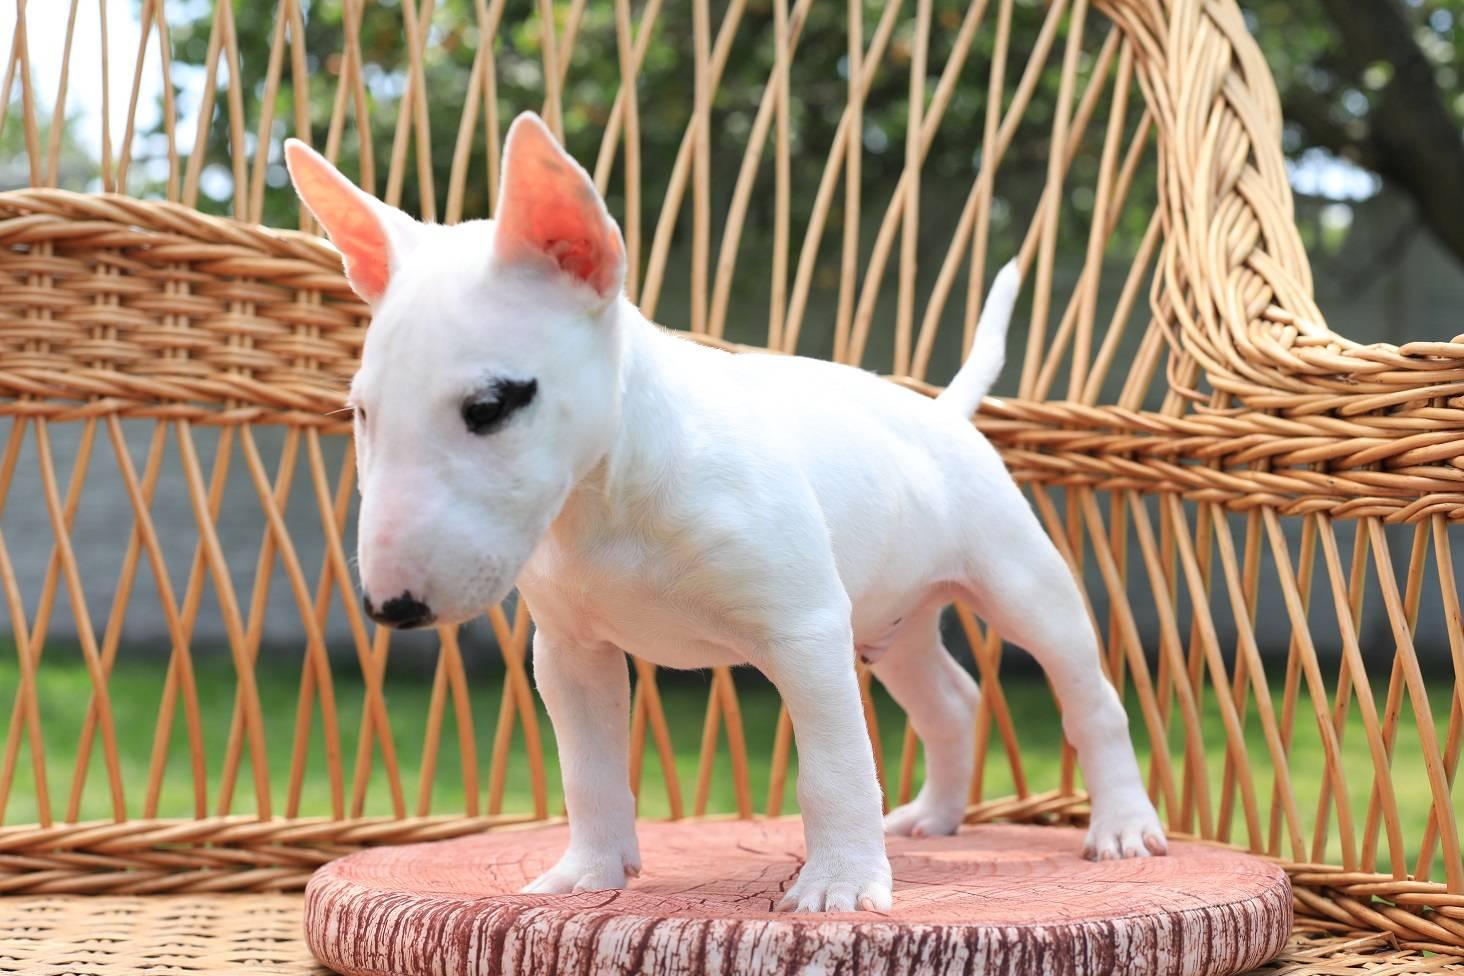 Мини бультерьер — фото, цена | dog-care - журнал про собак